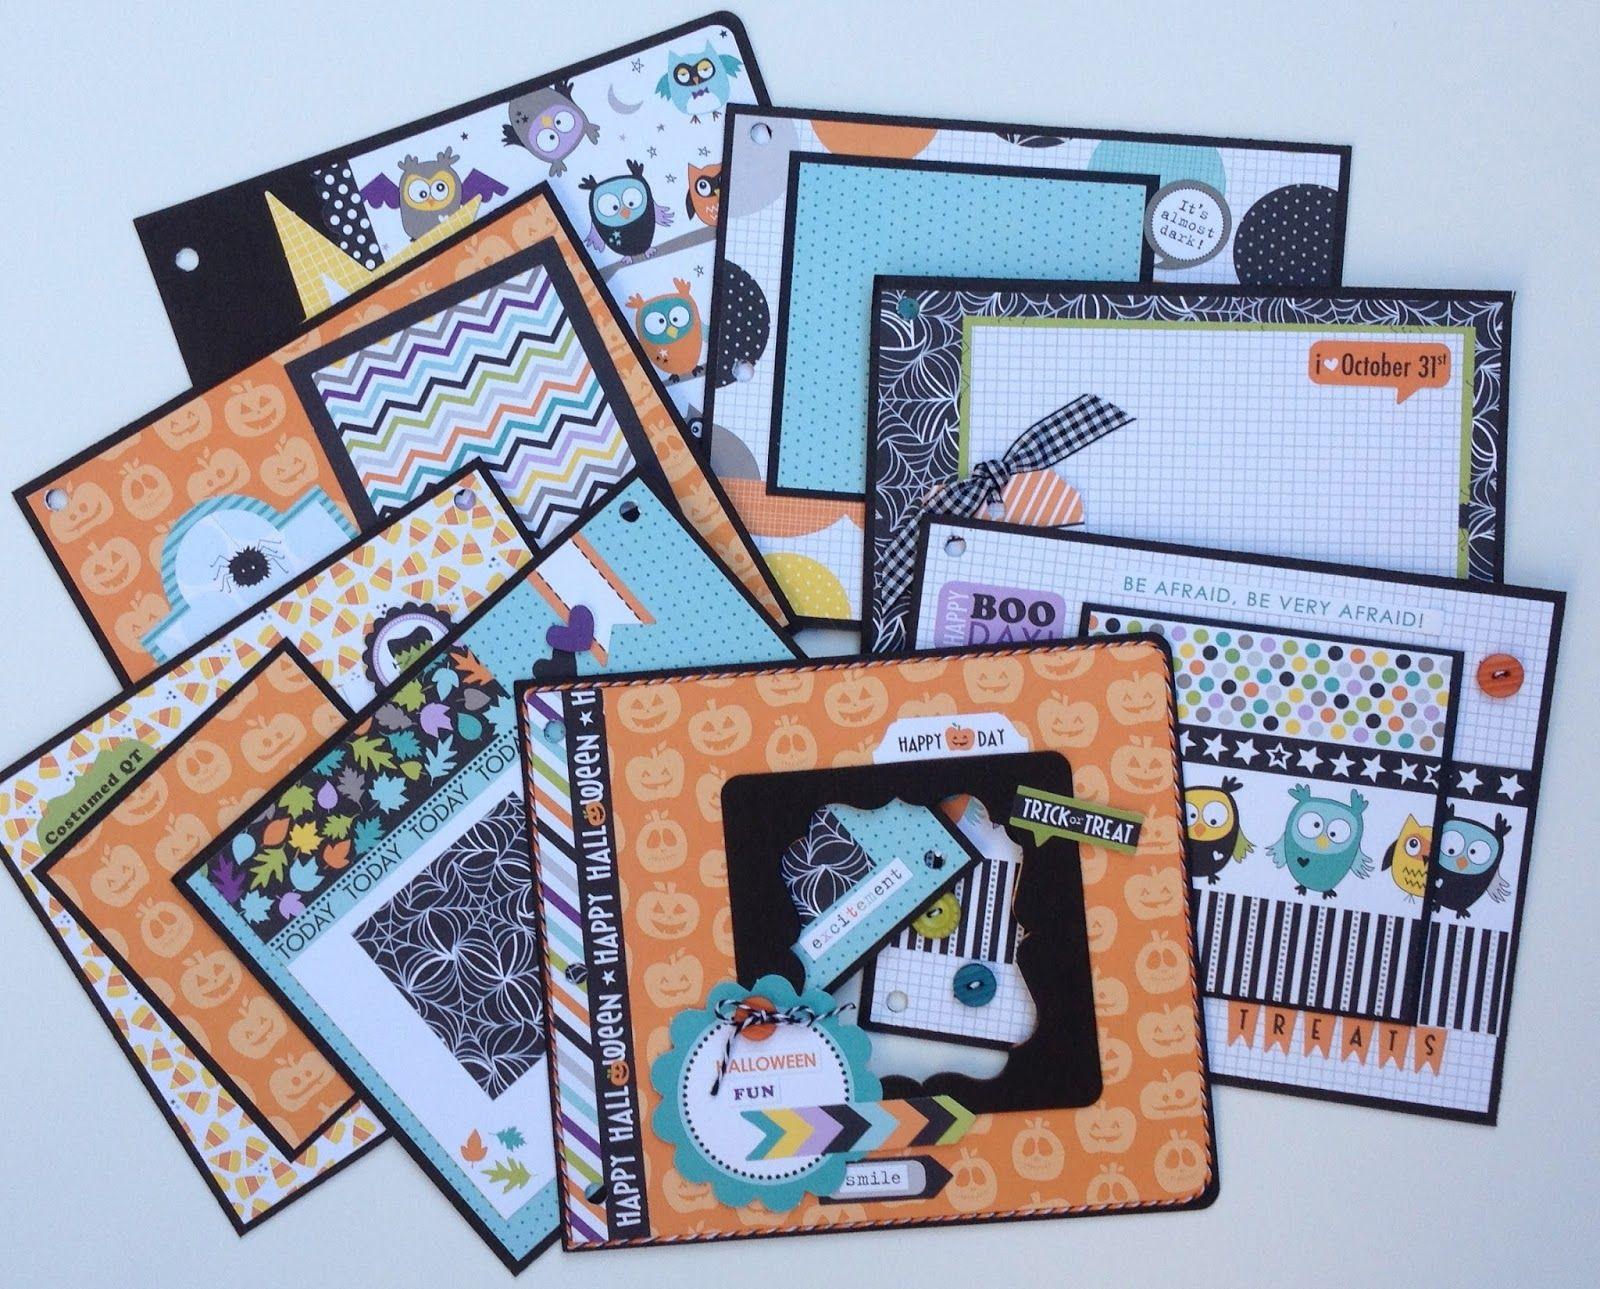 Artsy Albums Scrapbooking Kits And Custom Designed Scrapbook Albums